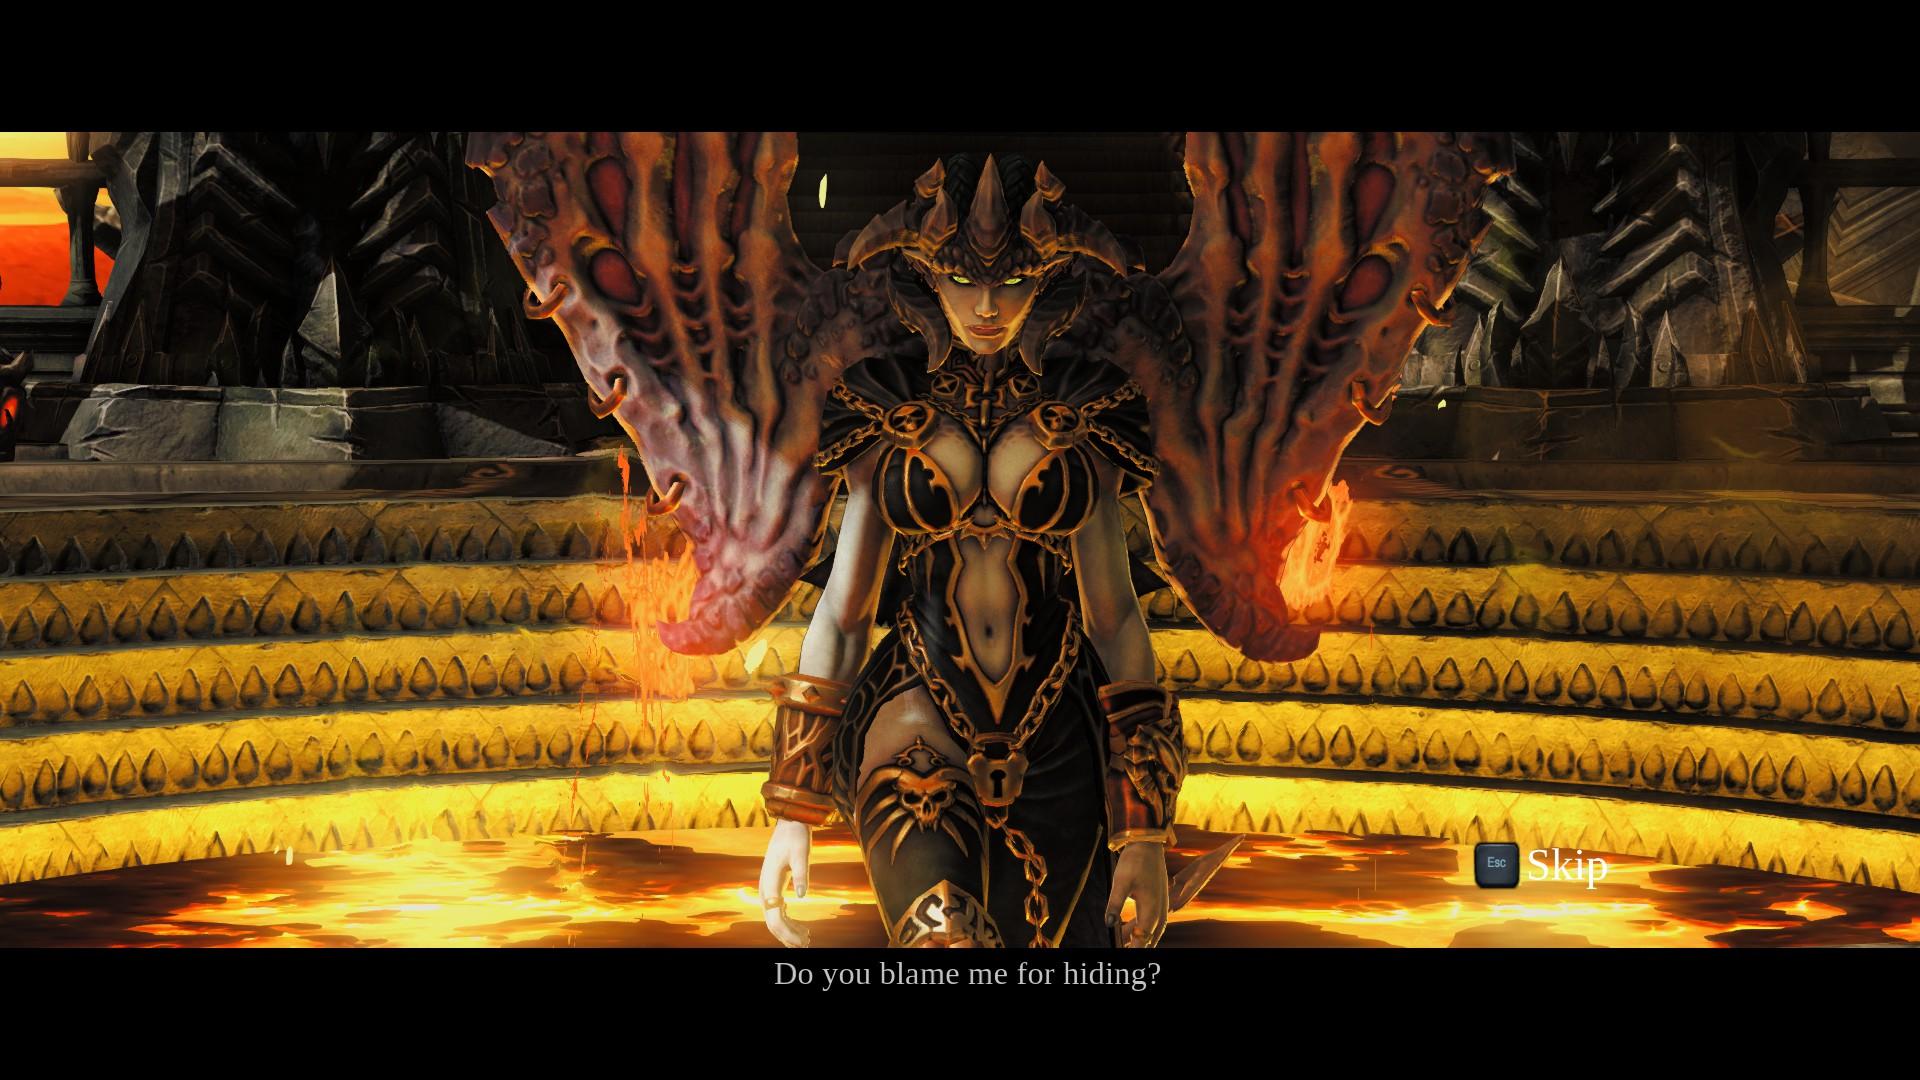 I Played Darksiders 2: Deathinitive Edition… – Twinstiq